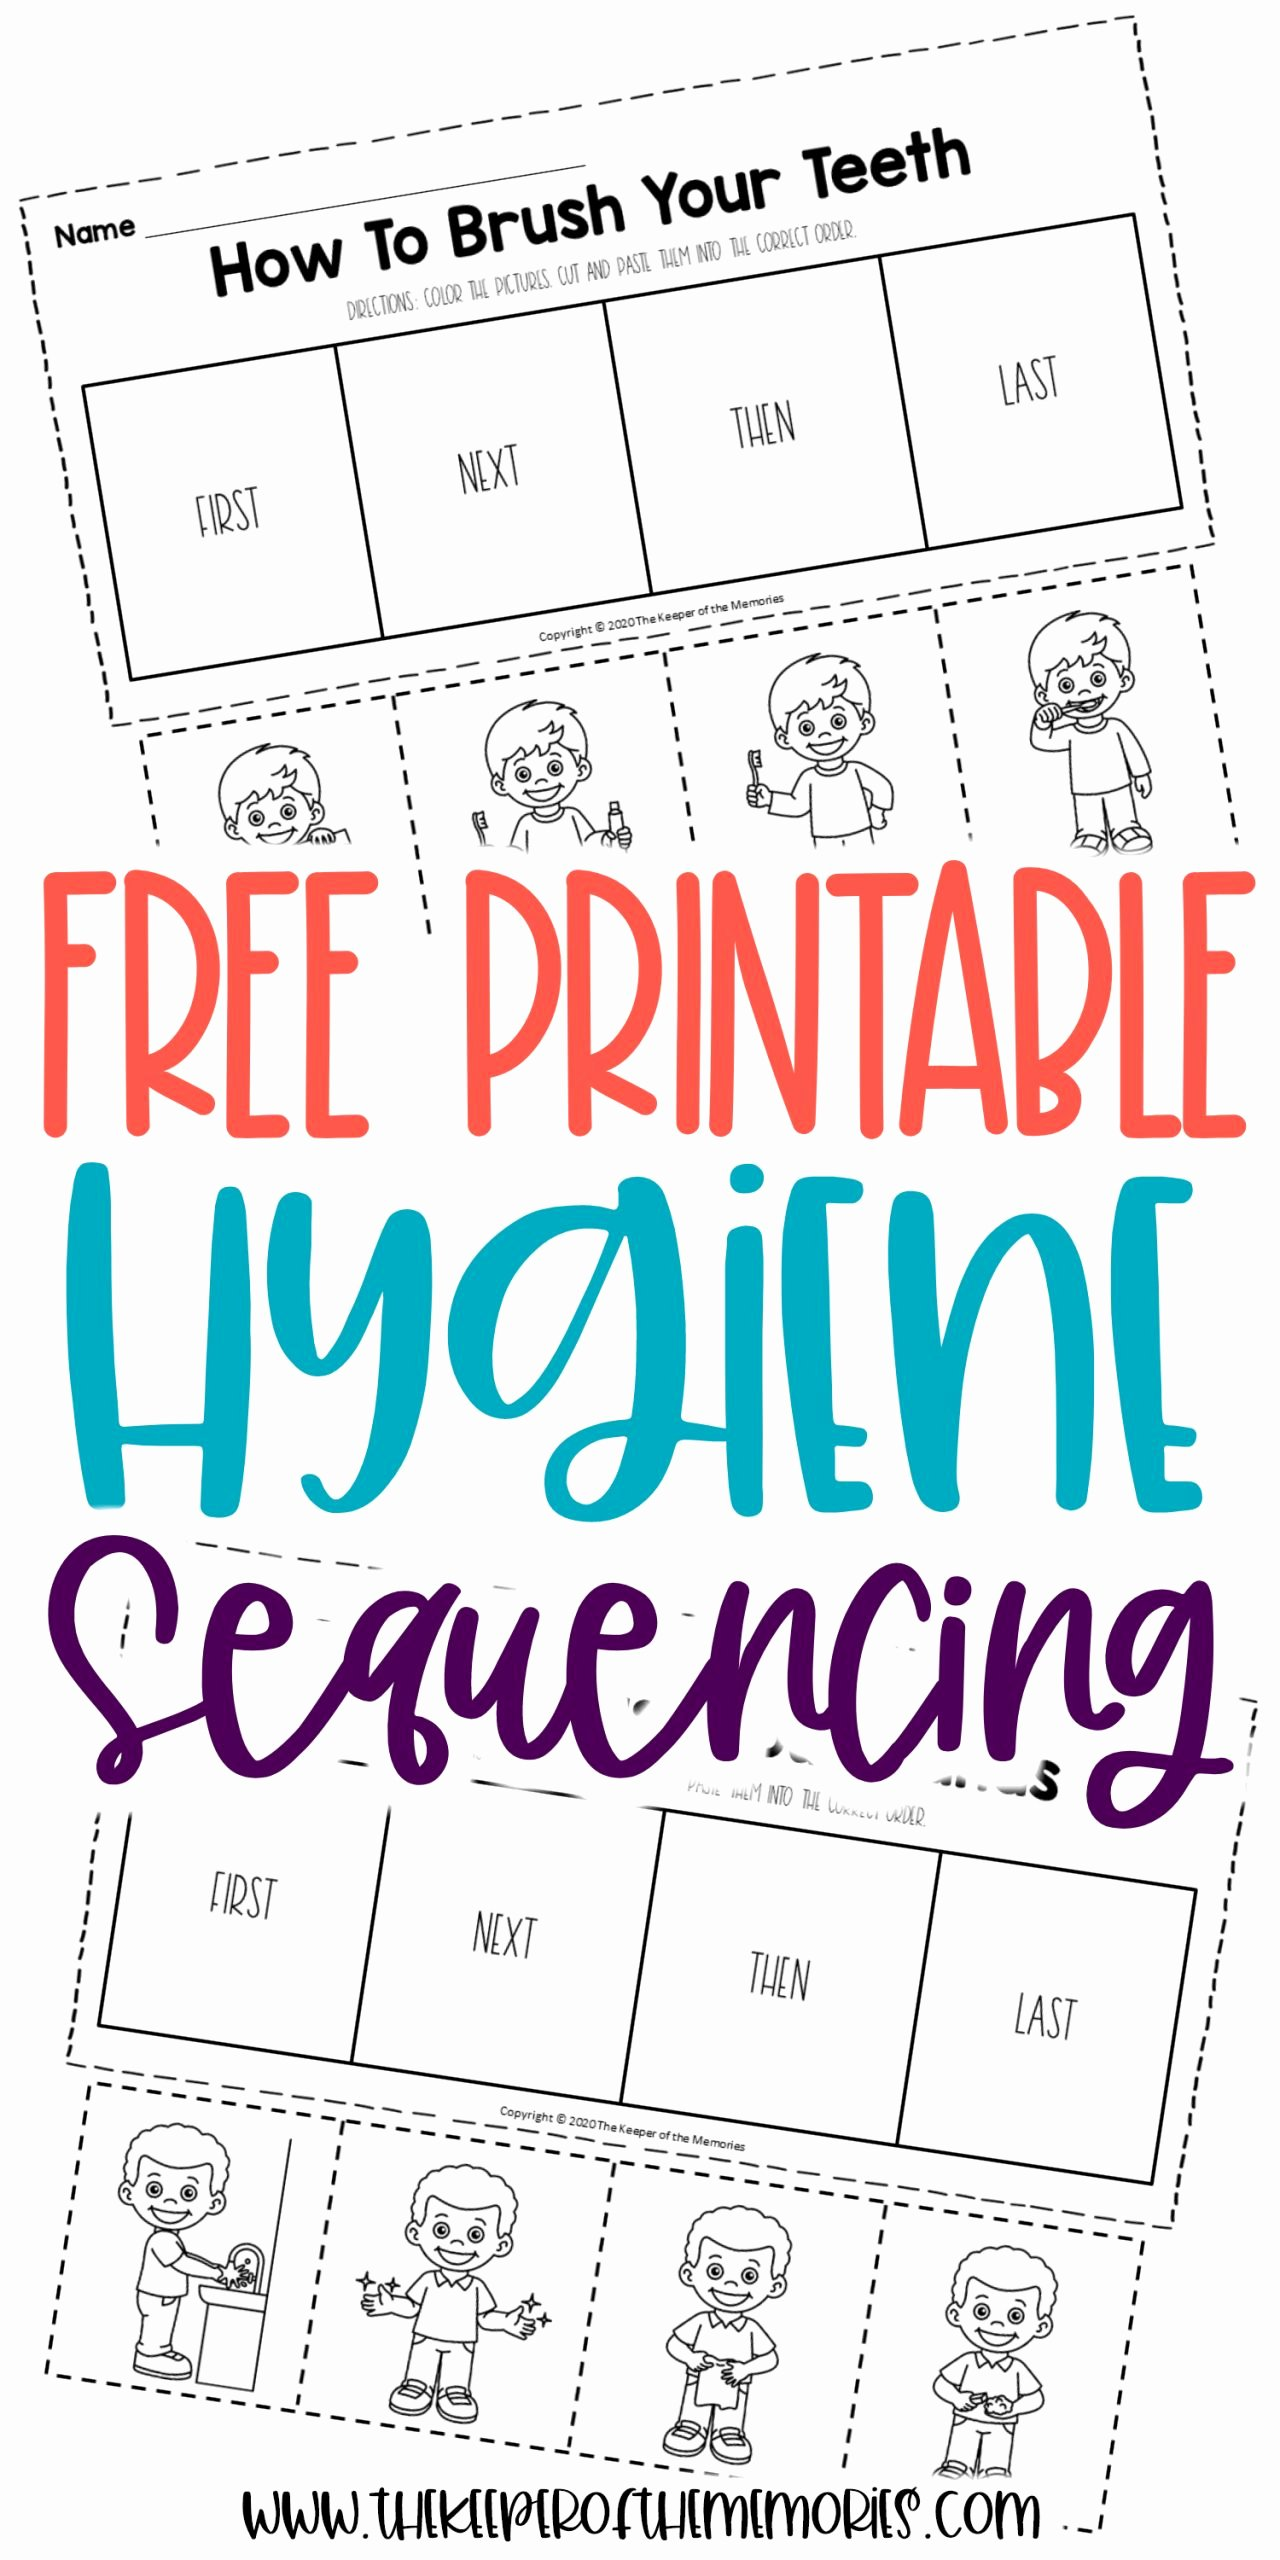 Hygiene Worksheets for Preschoolers Unique Free Printable Preschool Sequencing Worksheets